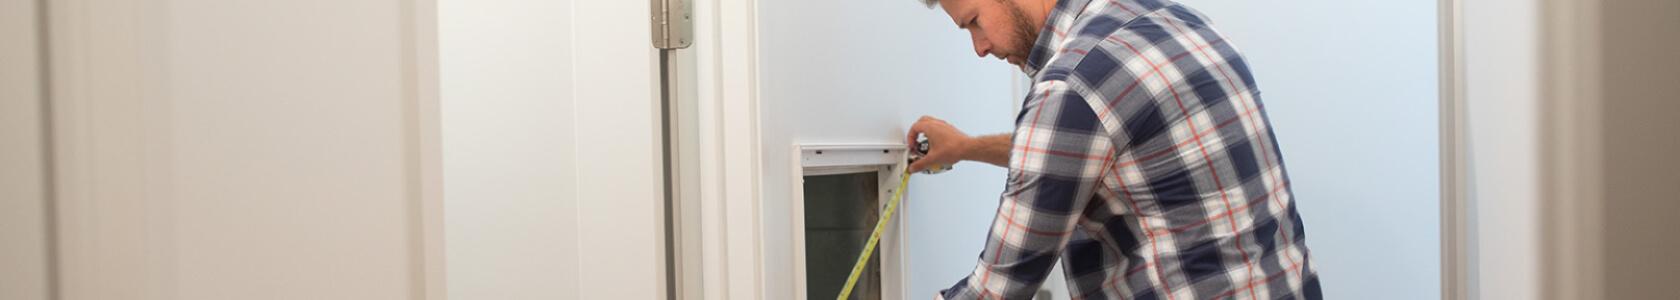 man measures vent for filter size